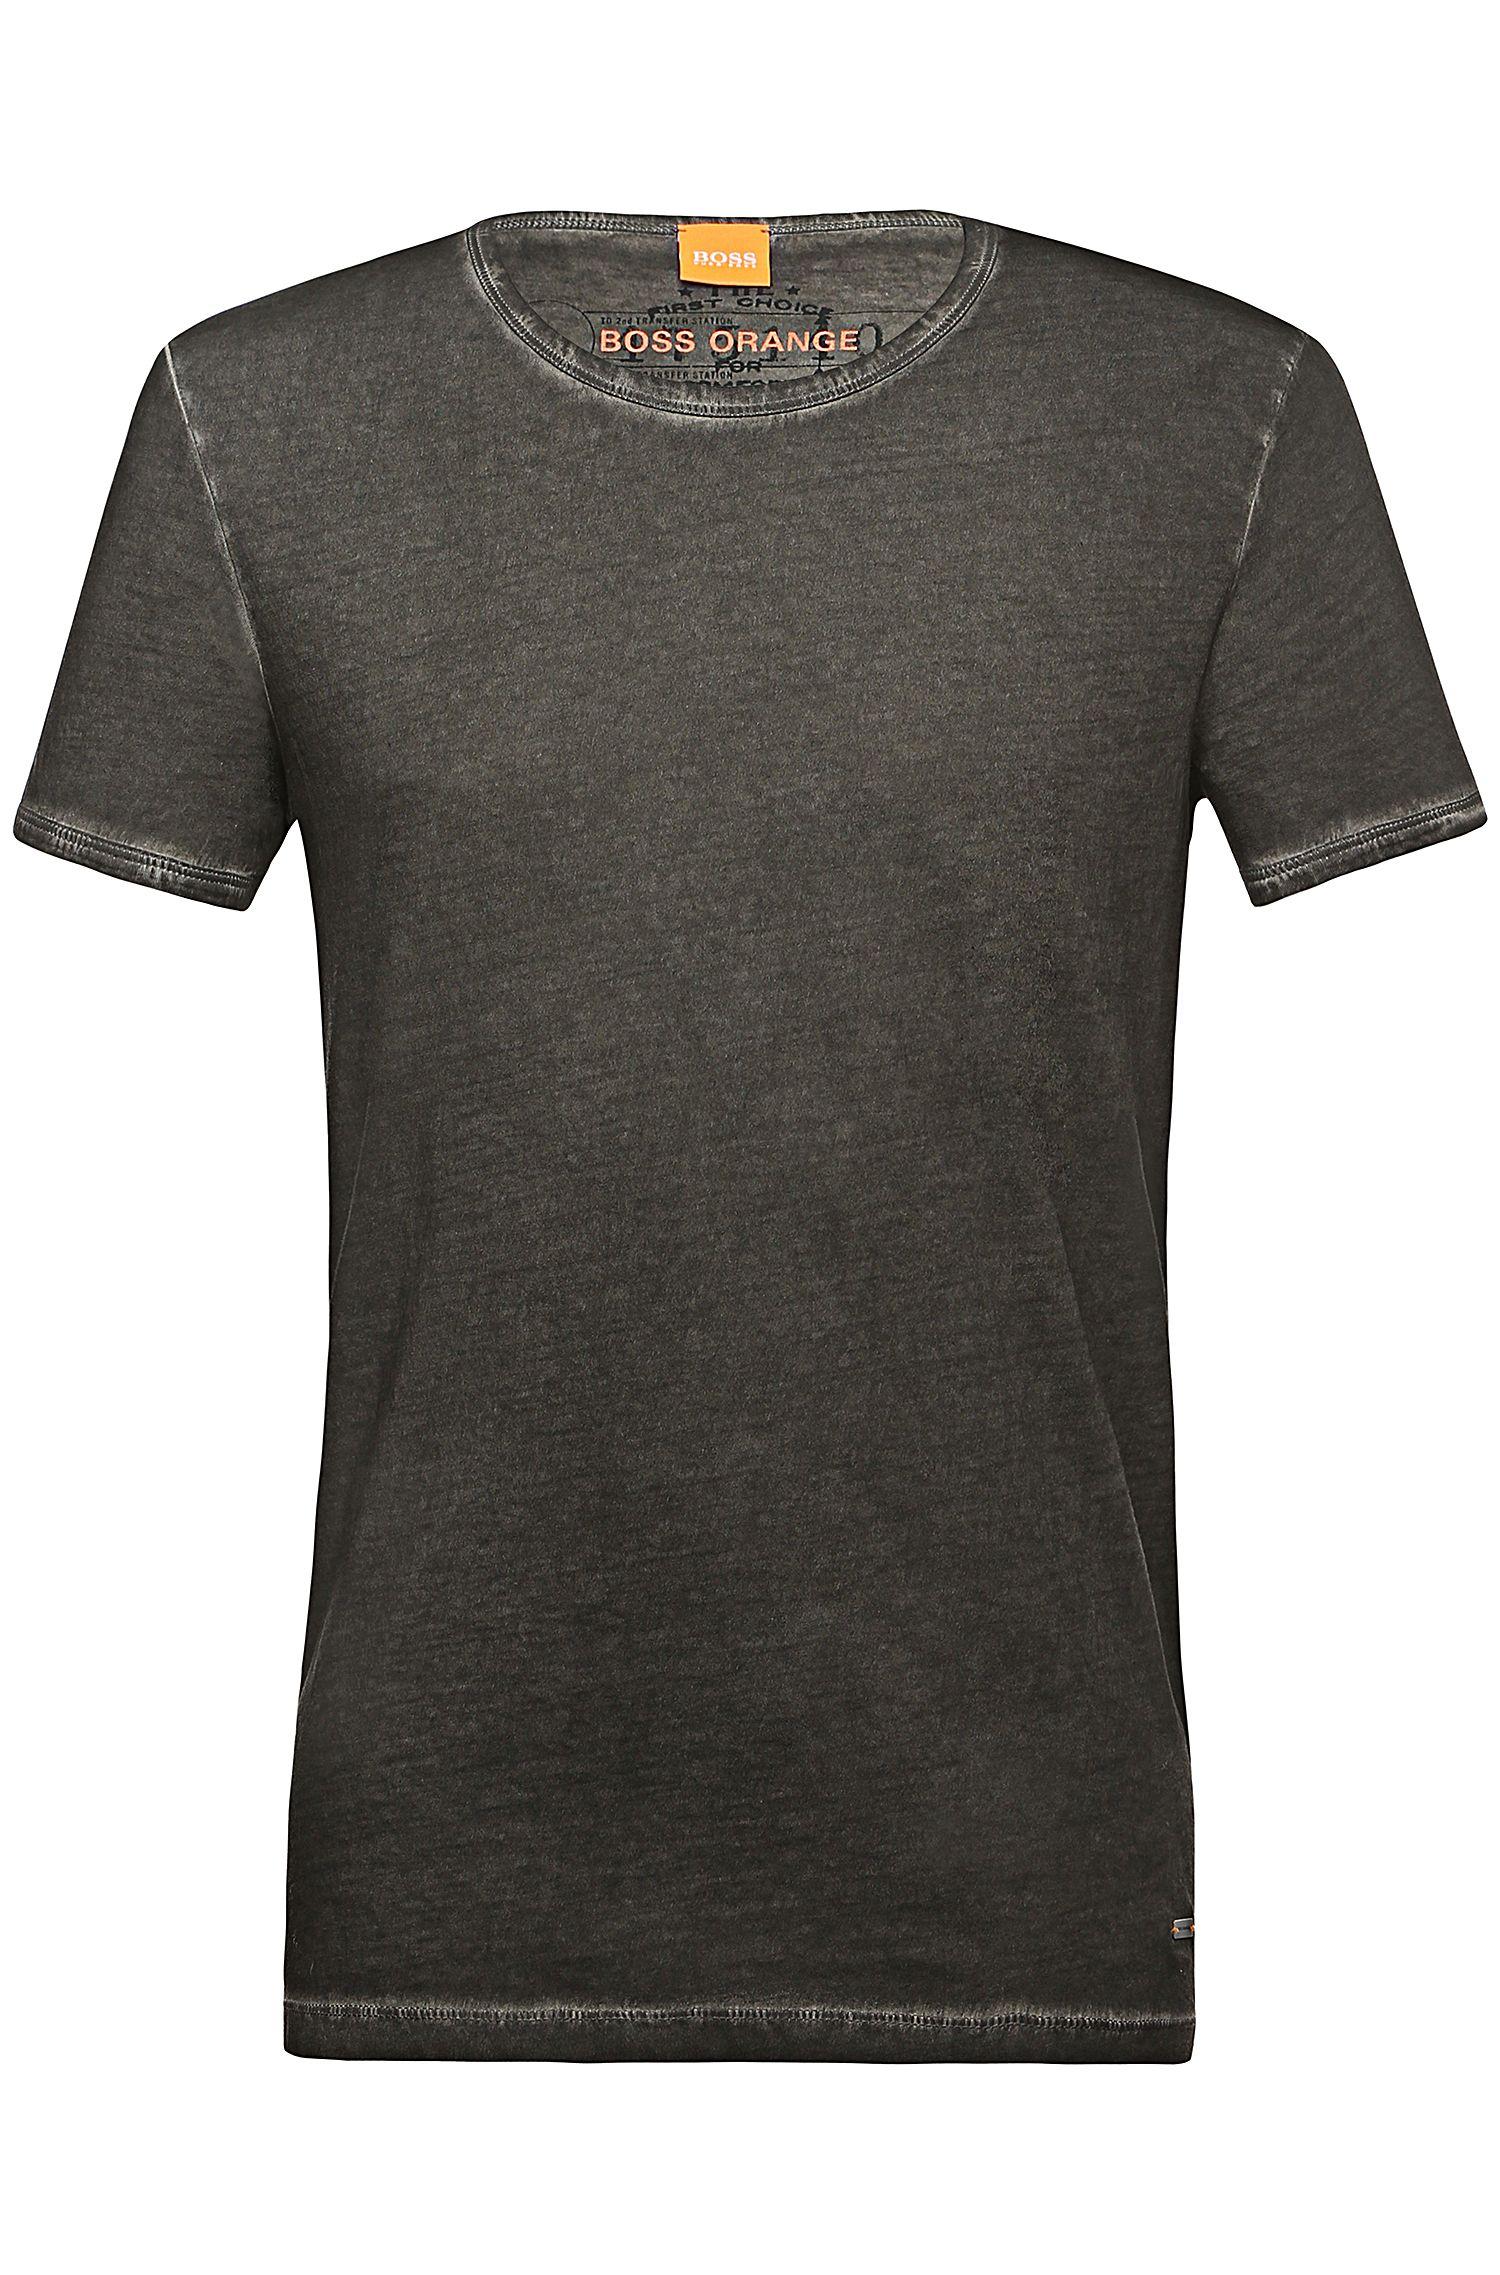 Cotton Garment Washed T-Shirt | Tour